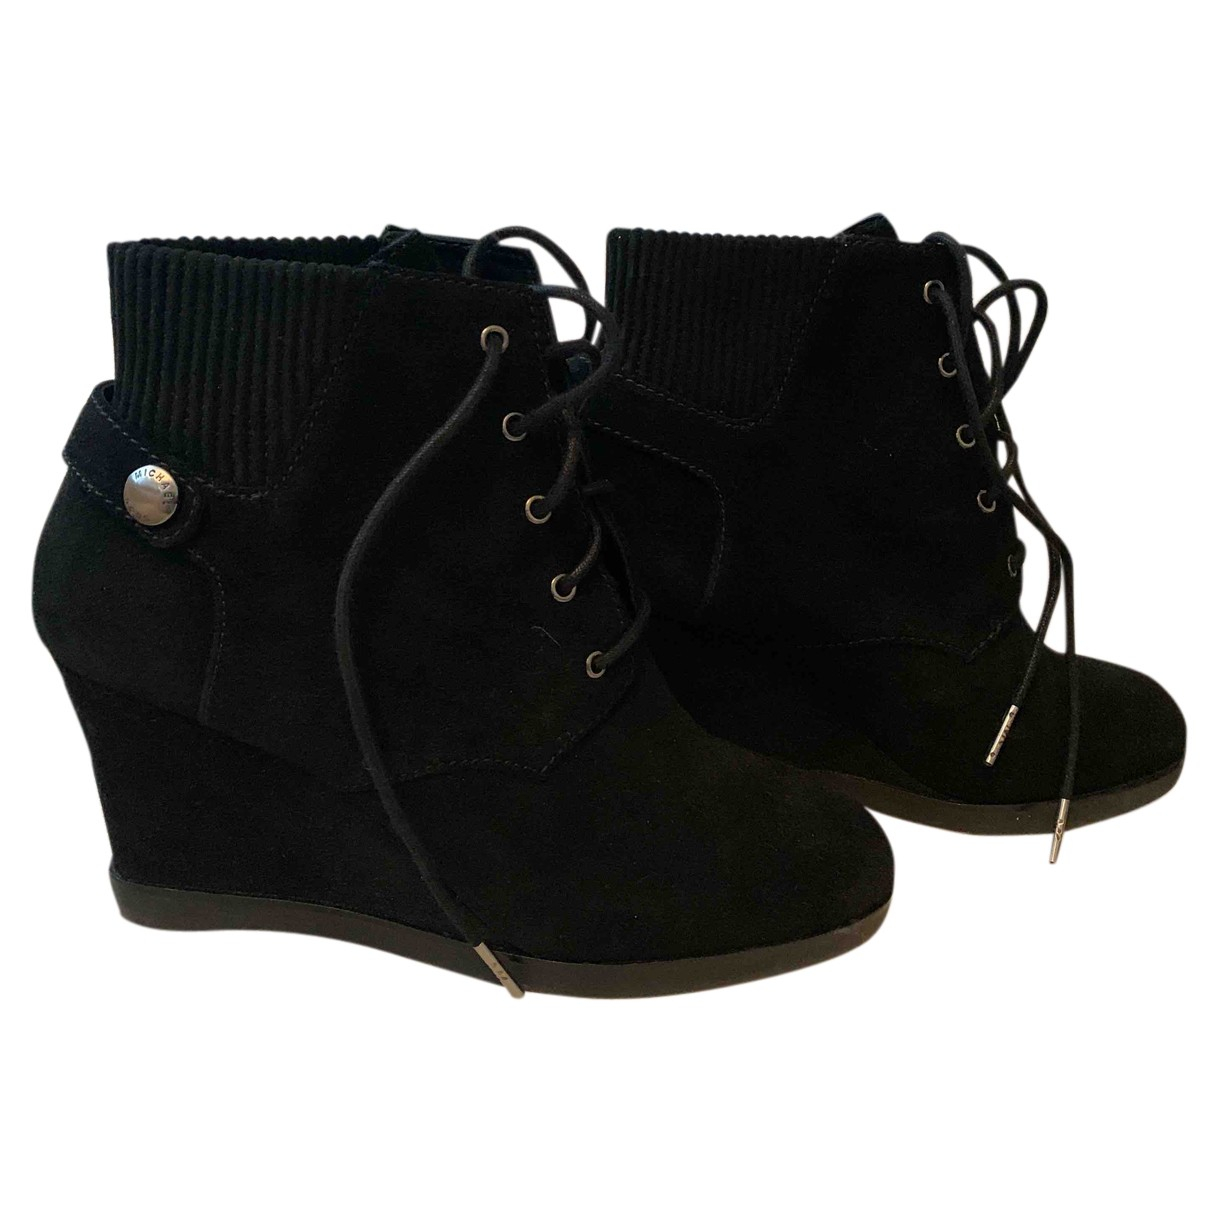 Kors Michael Kors N Black Suede Ankle boots for Women 39 EU